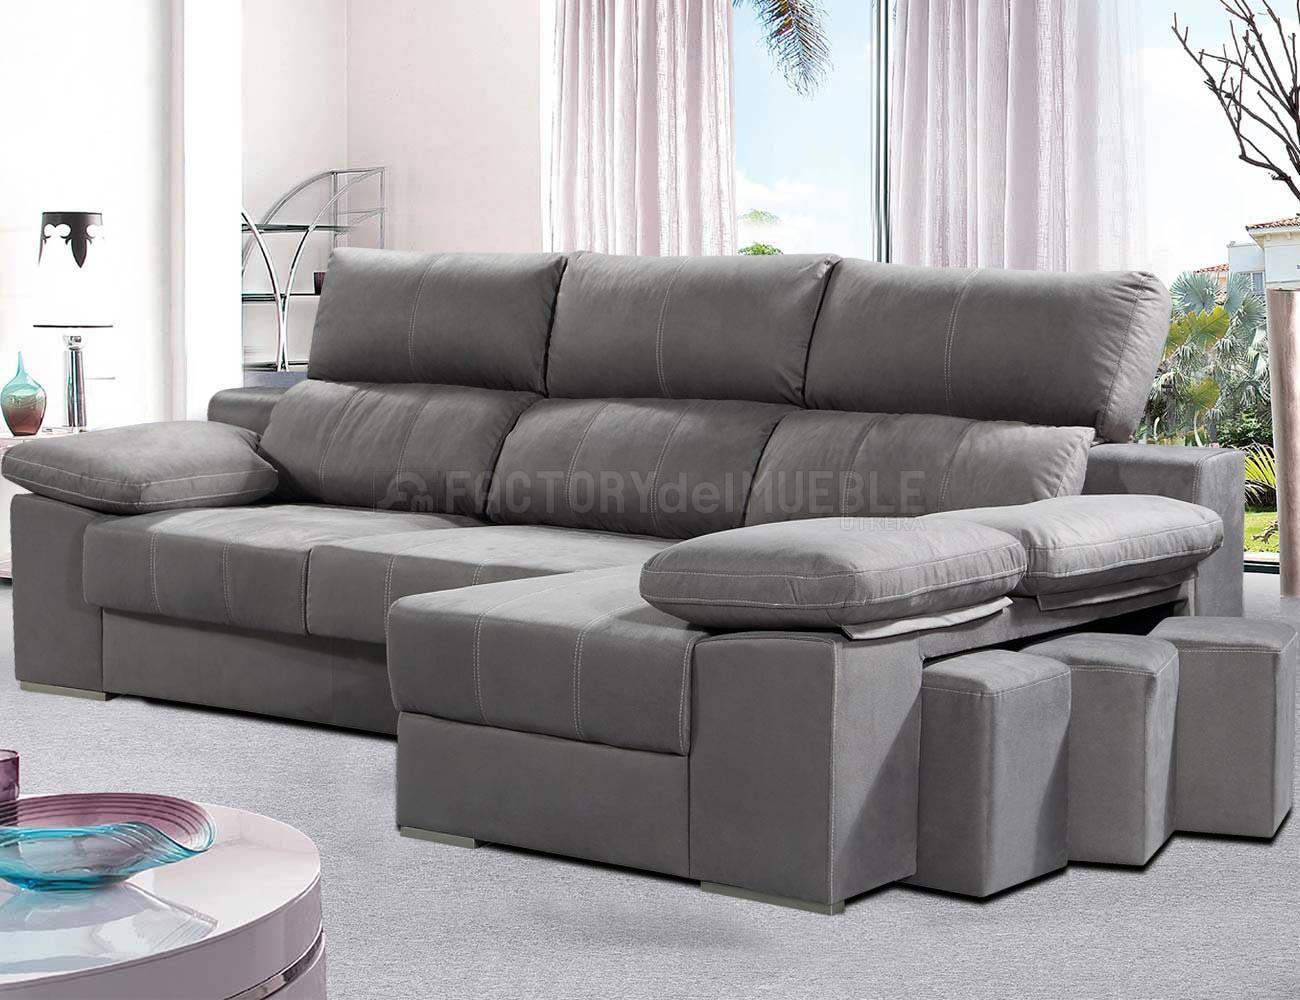 Sofa chaiselongue reversible 3 taburetes asientos extraible gris ceniza